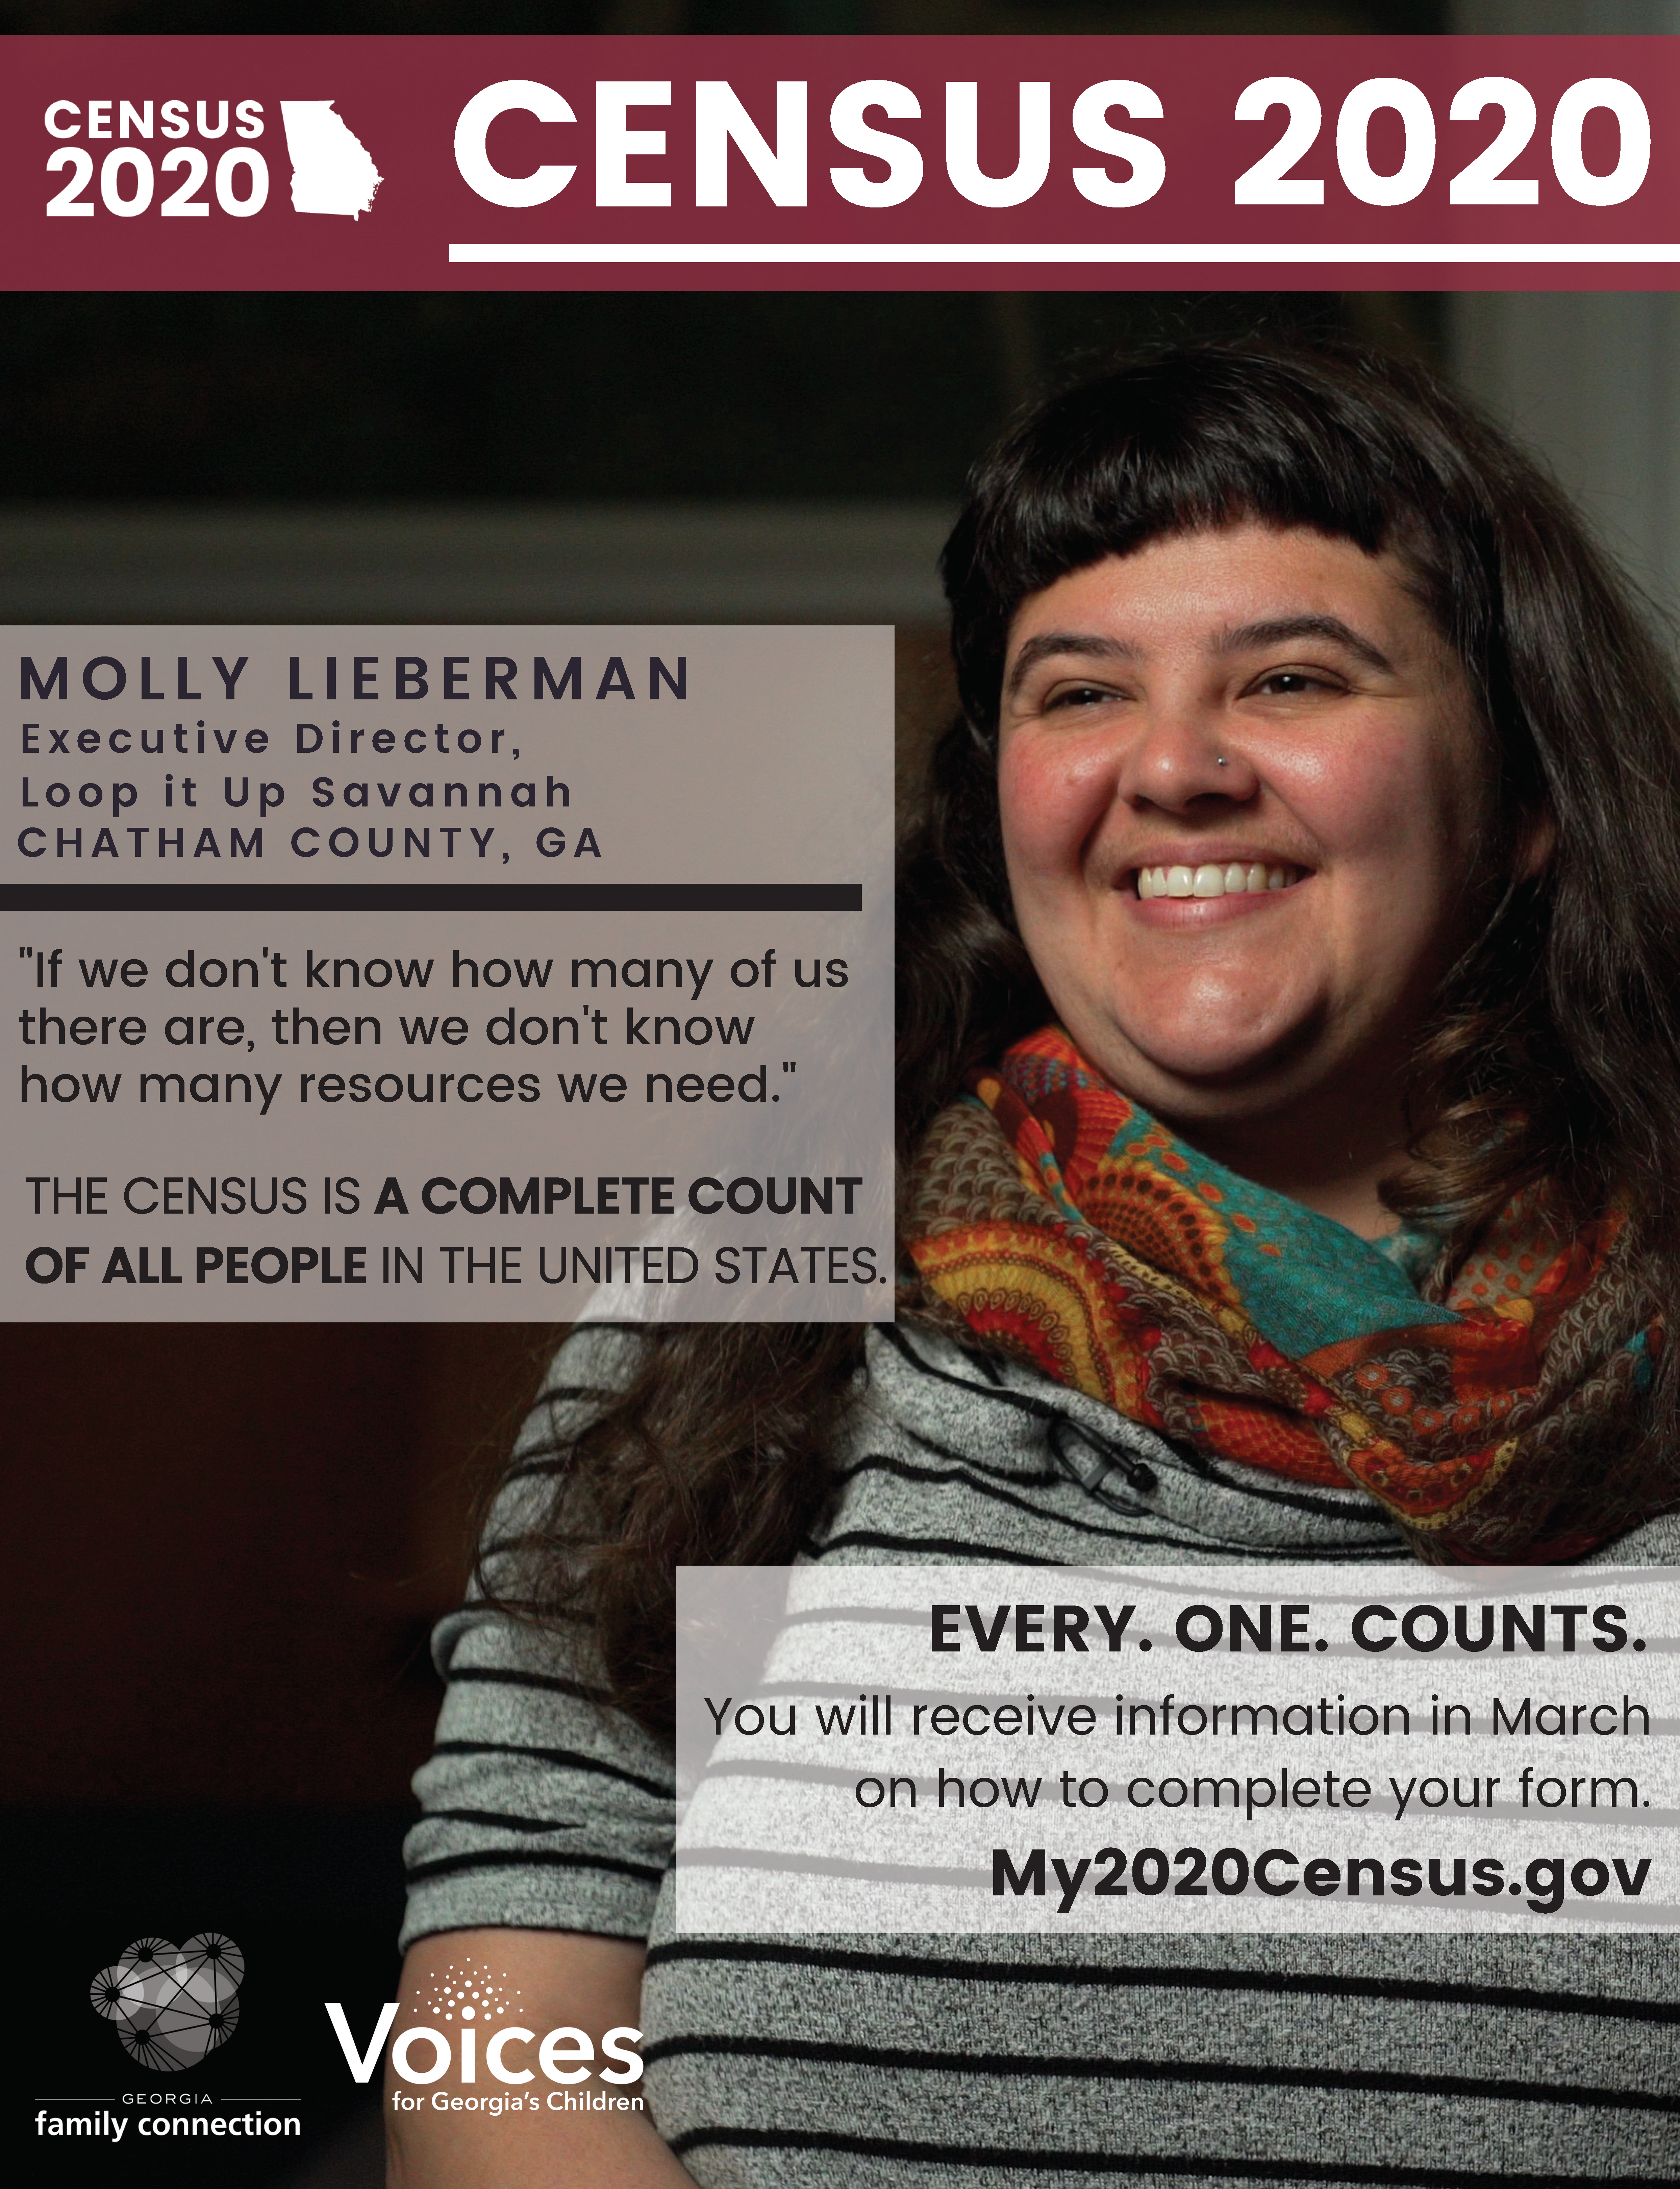 Molly Lieberman Poster